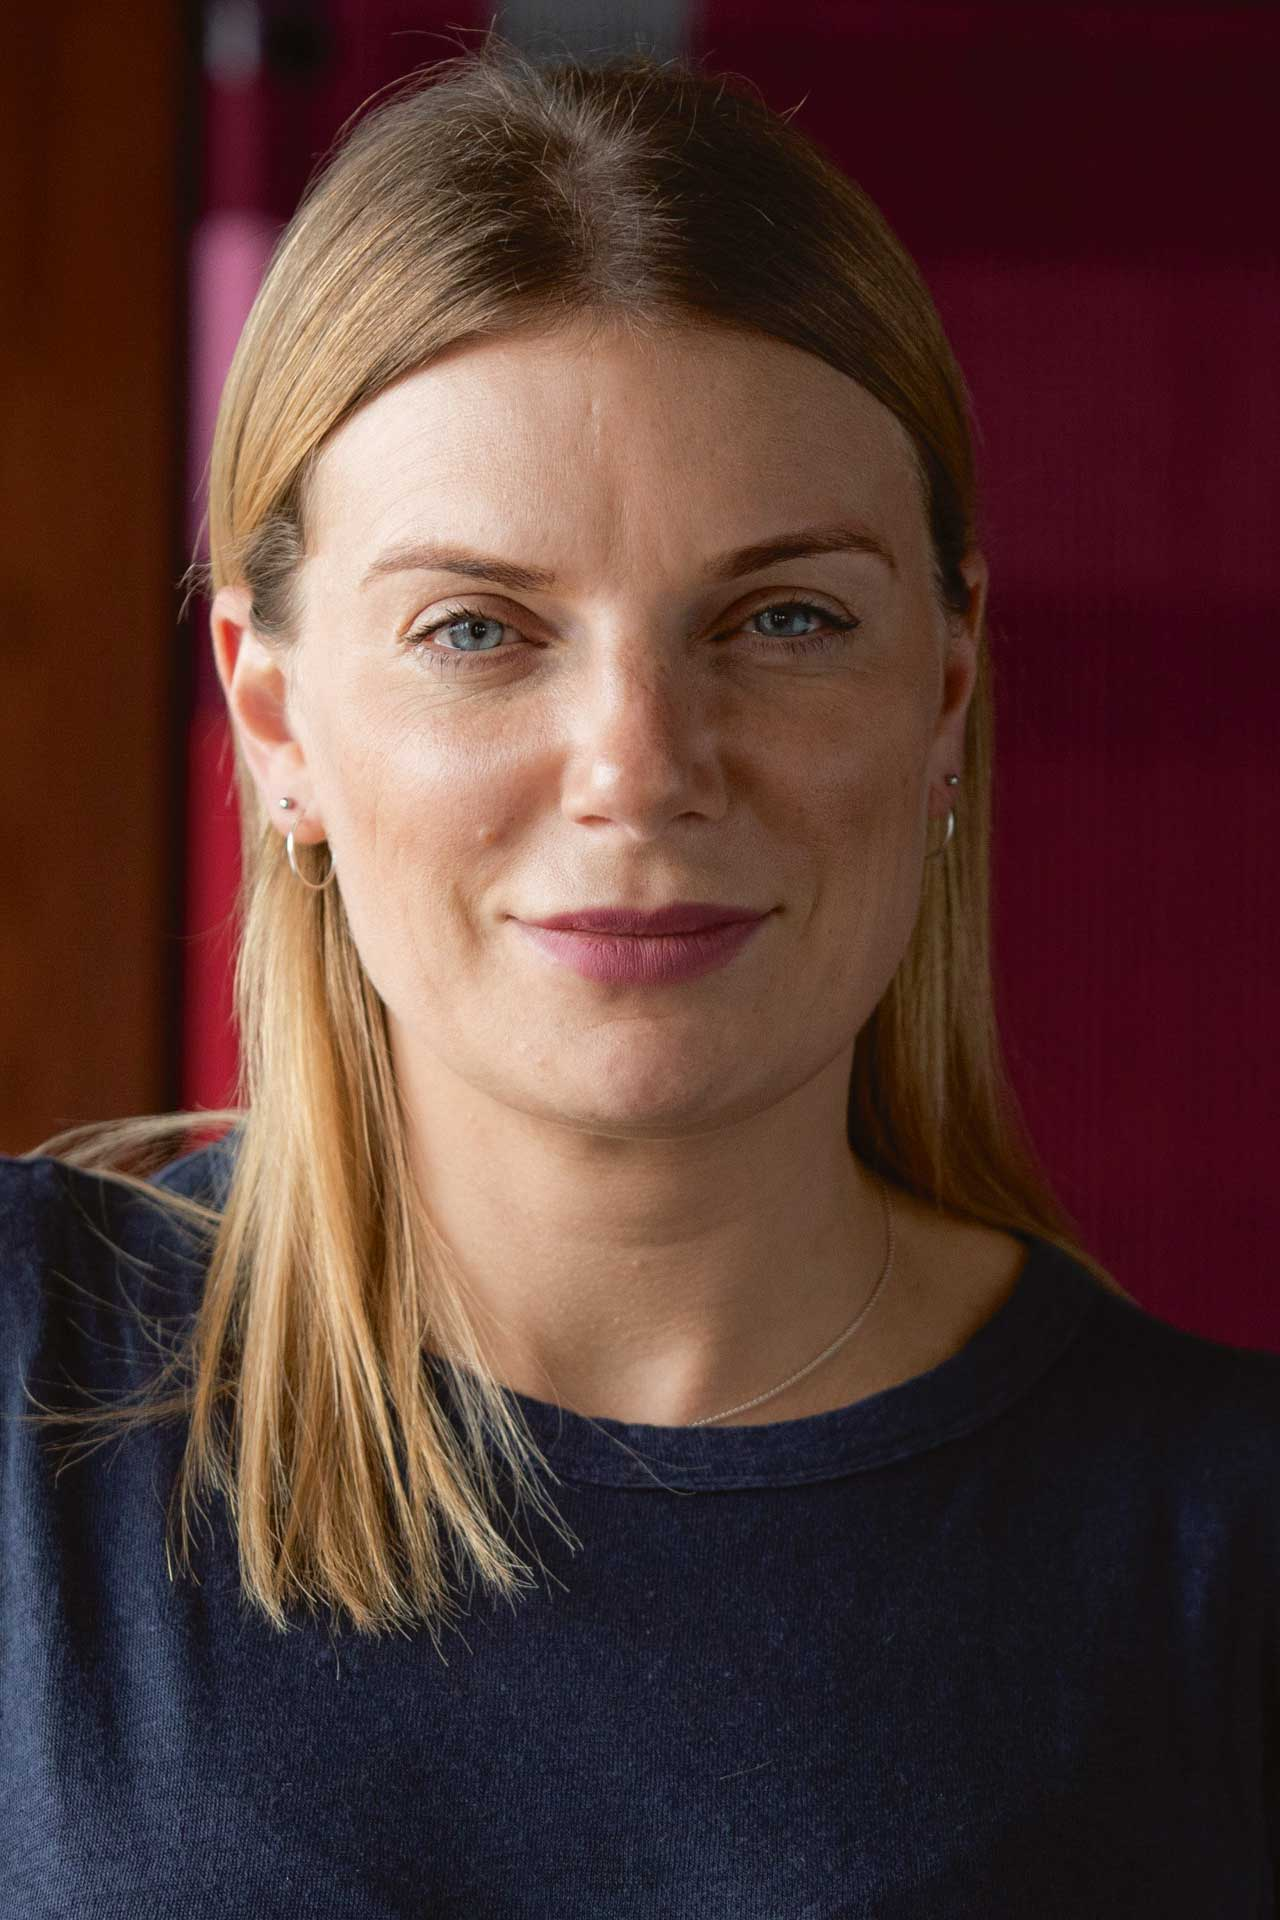 Helenka Fletcher, Executive Director of F&B at The Standard